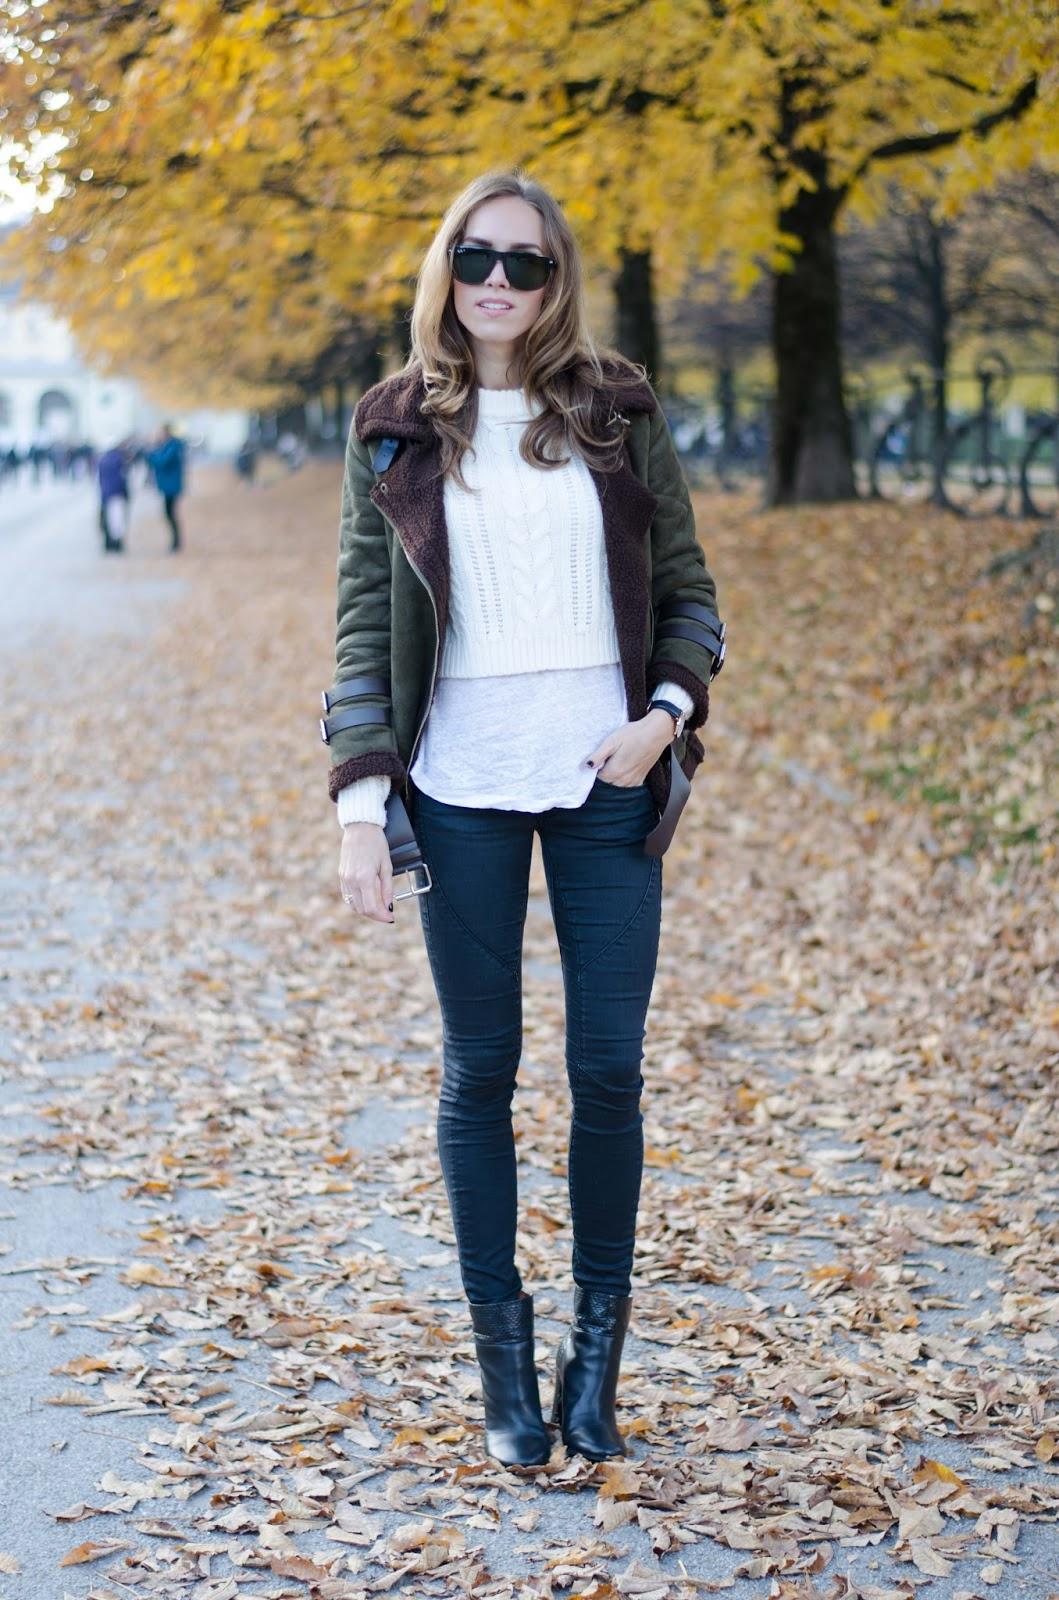 kristjaana mere shearling jacket fall outfit fashion inspiration